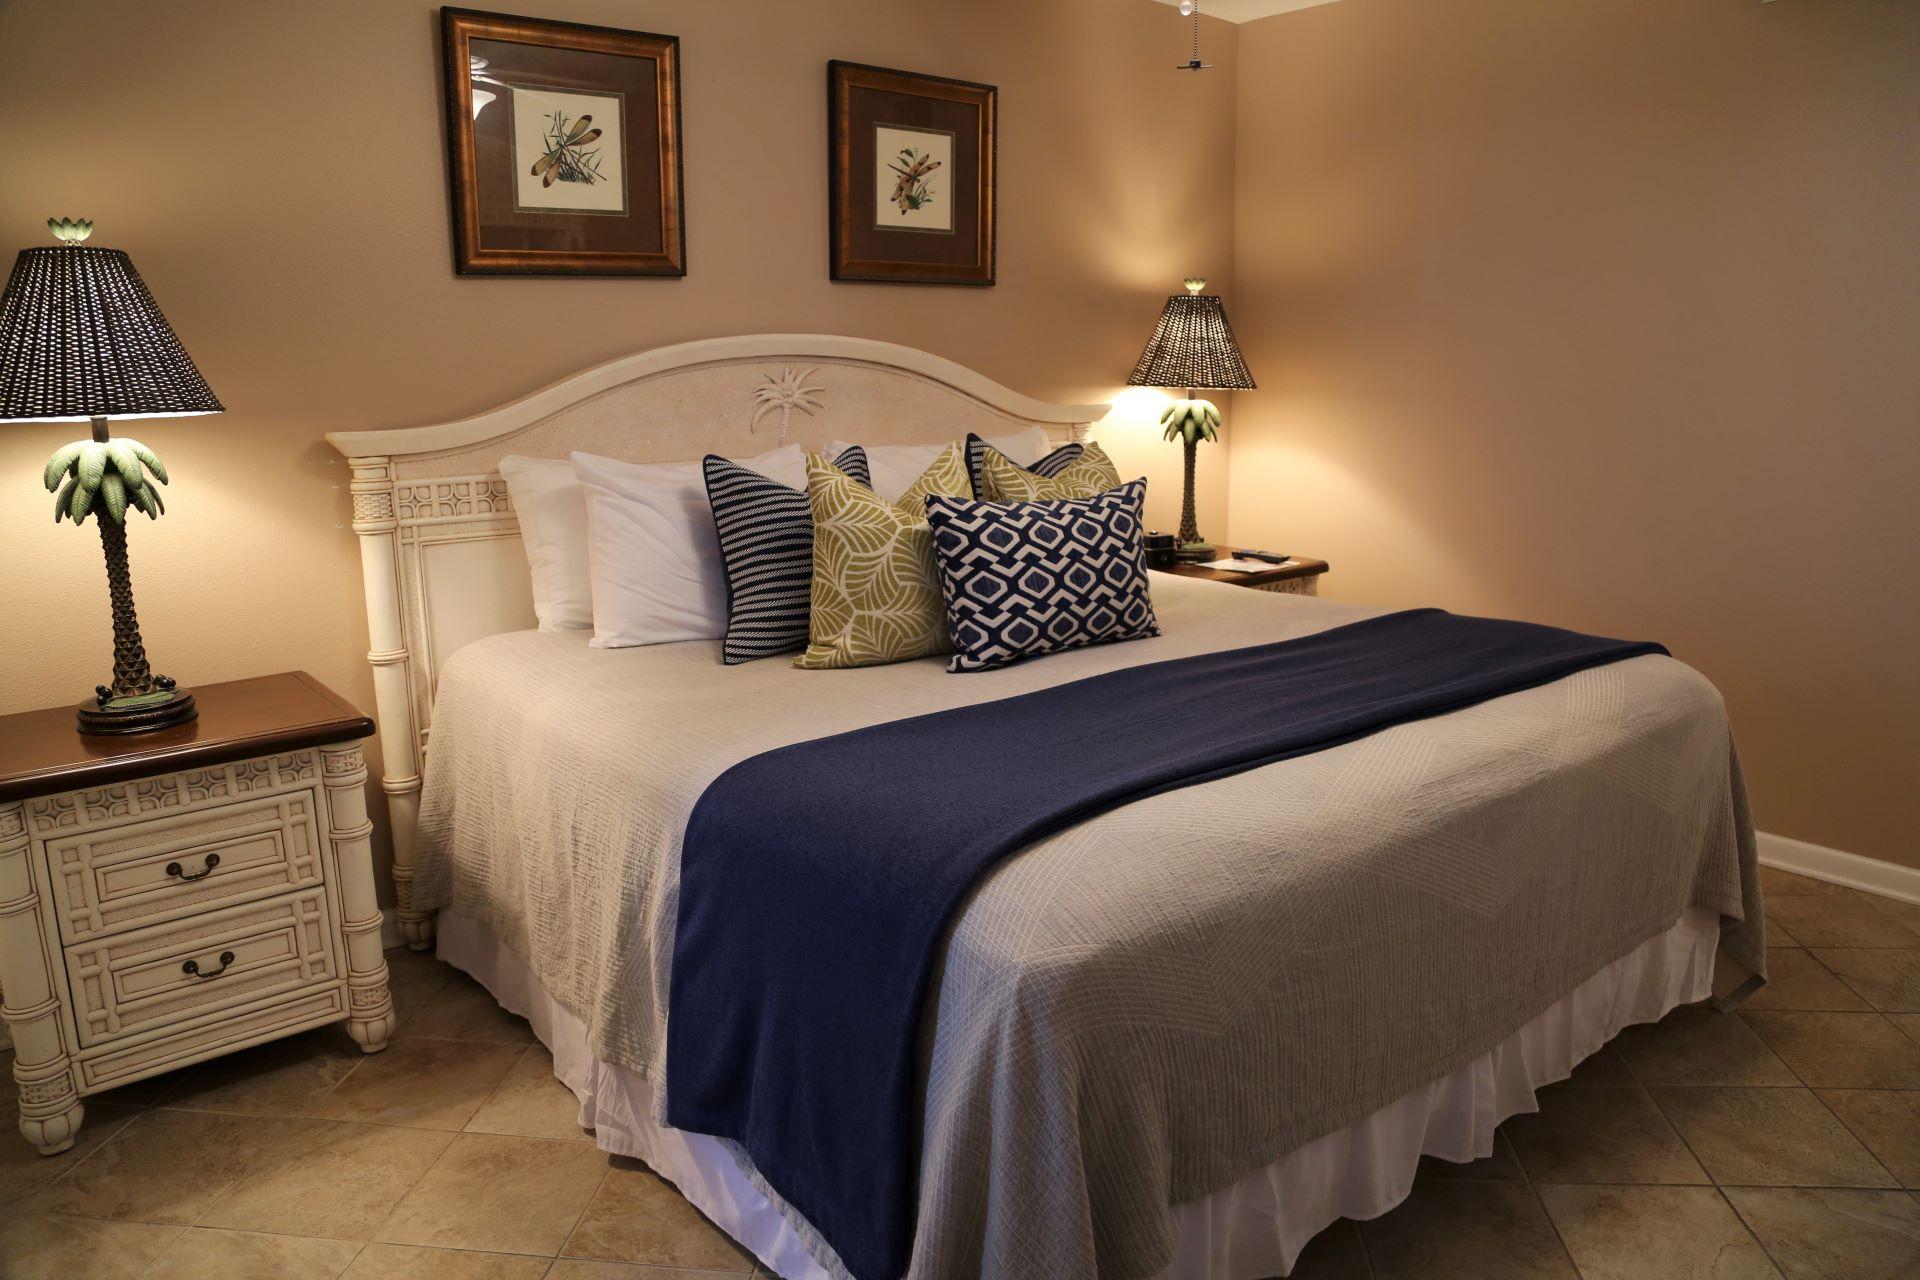 Warm hues and comfortable mattress ensures optimal rest.